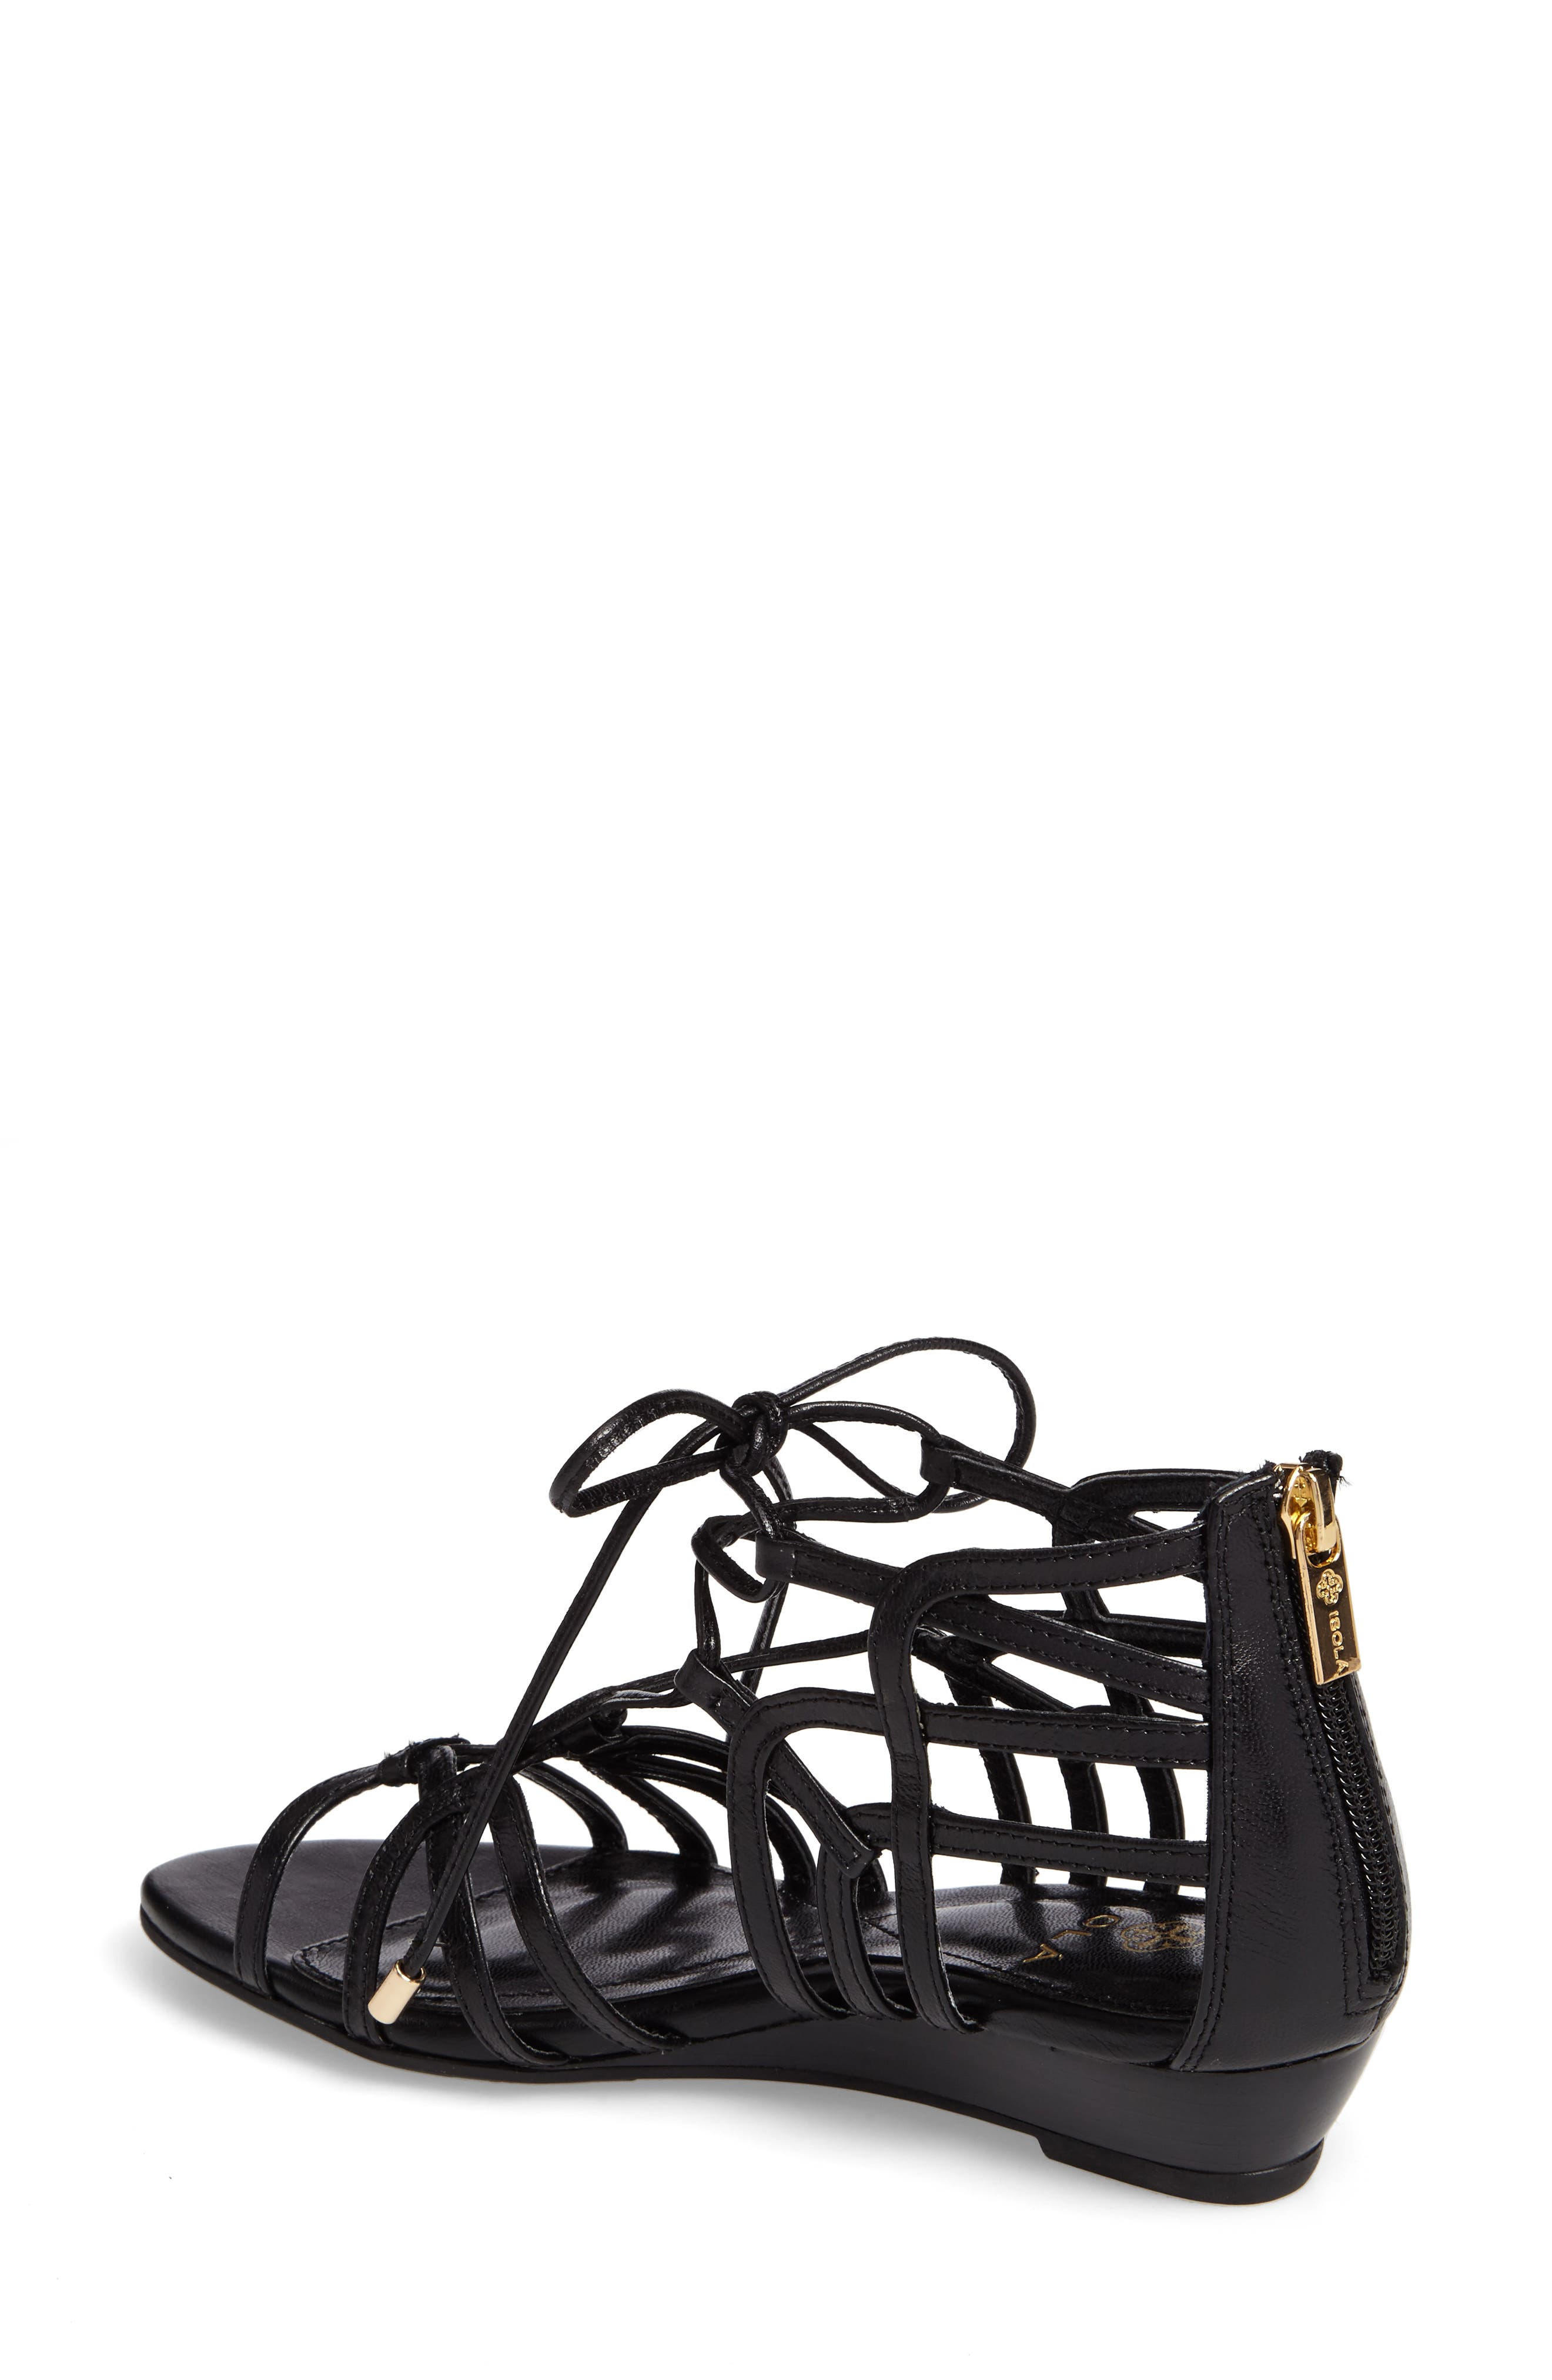 Elisia Lace-Up Sandal,                             Alternate thumbnail 2, color,                             BLACK LEATHER